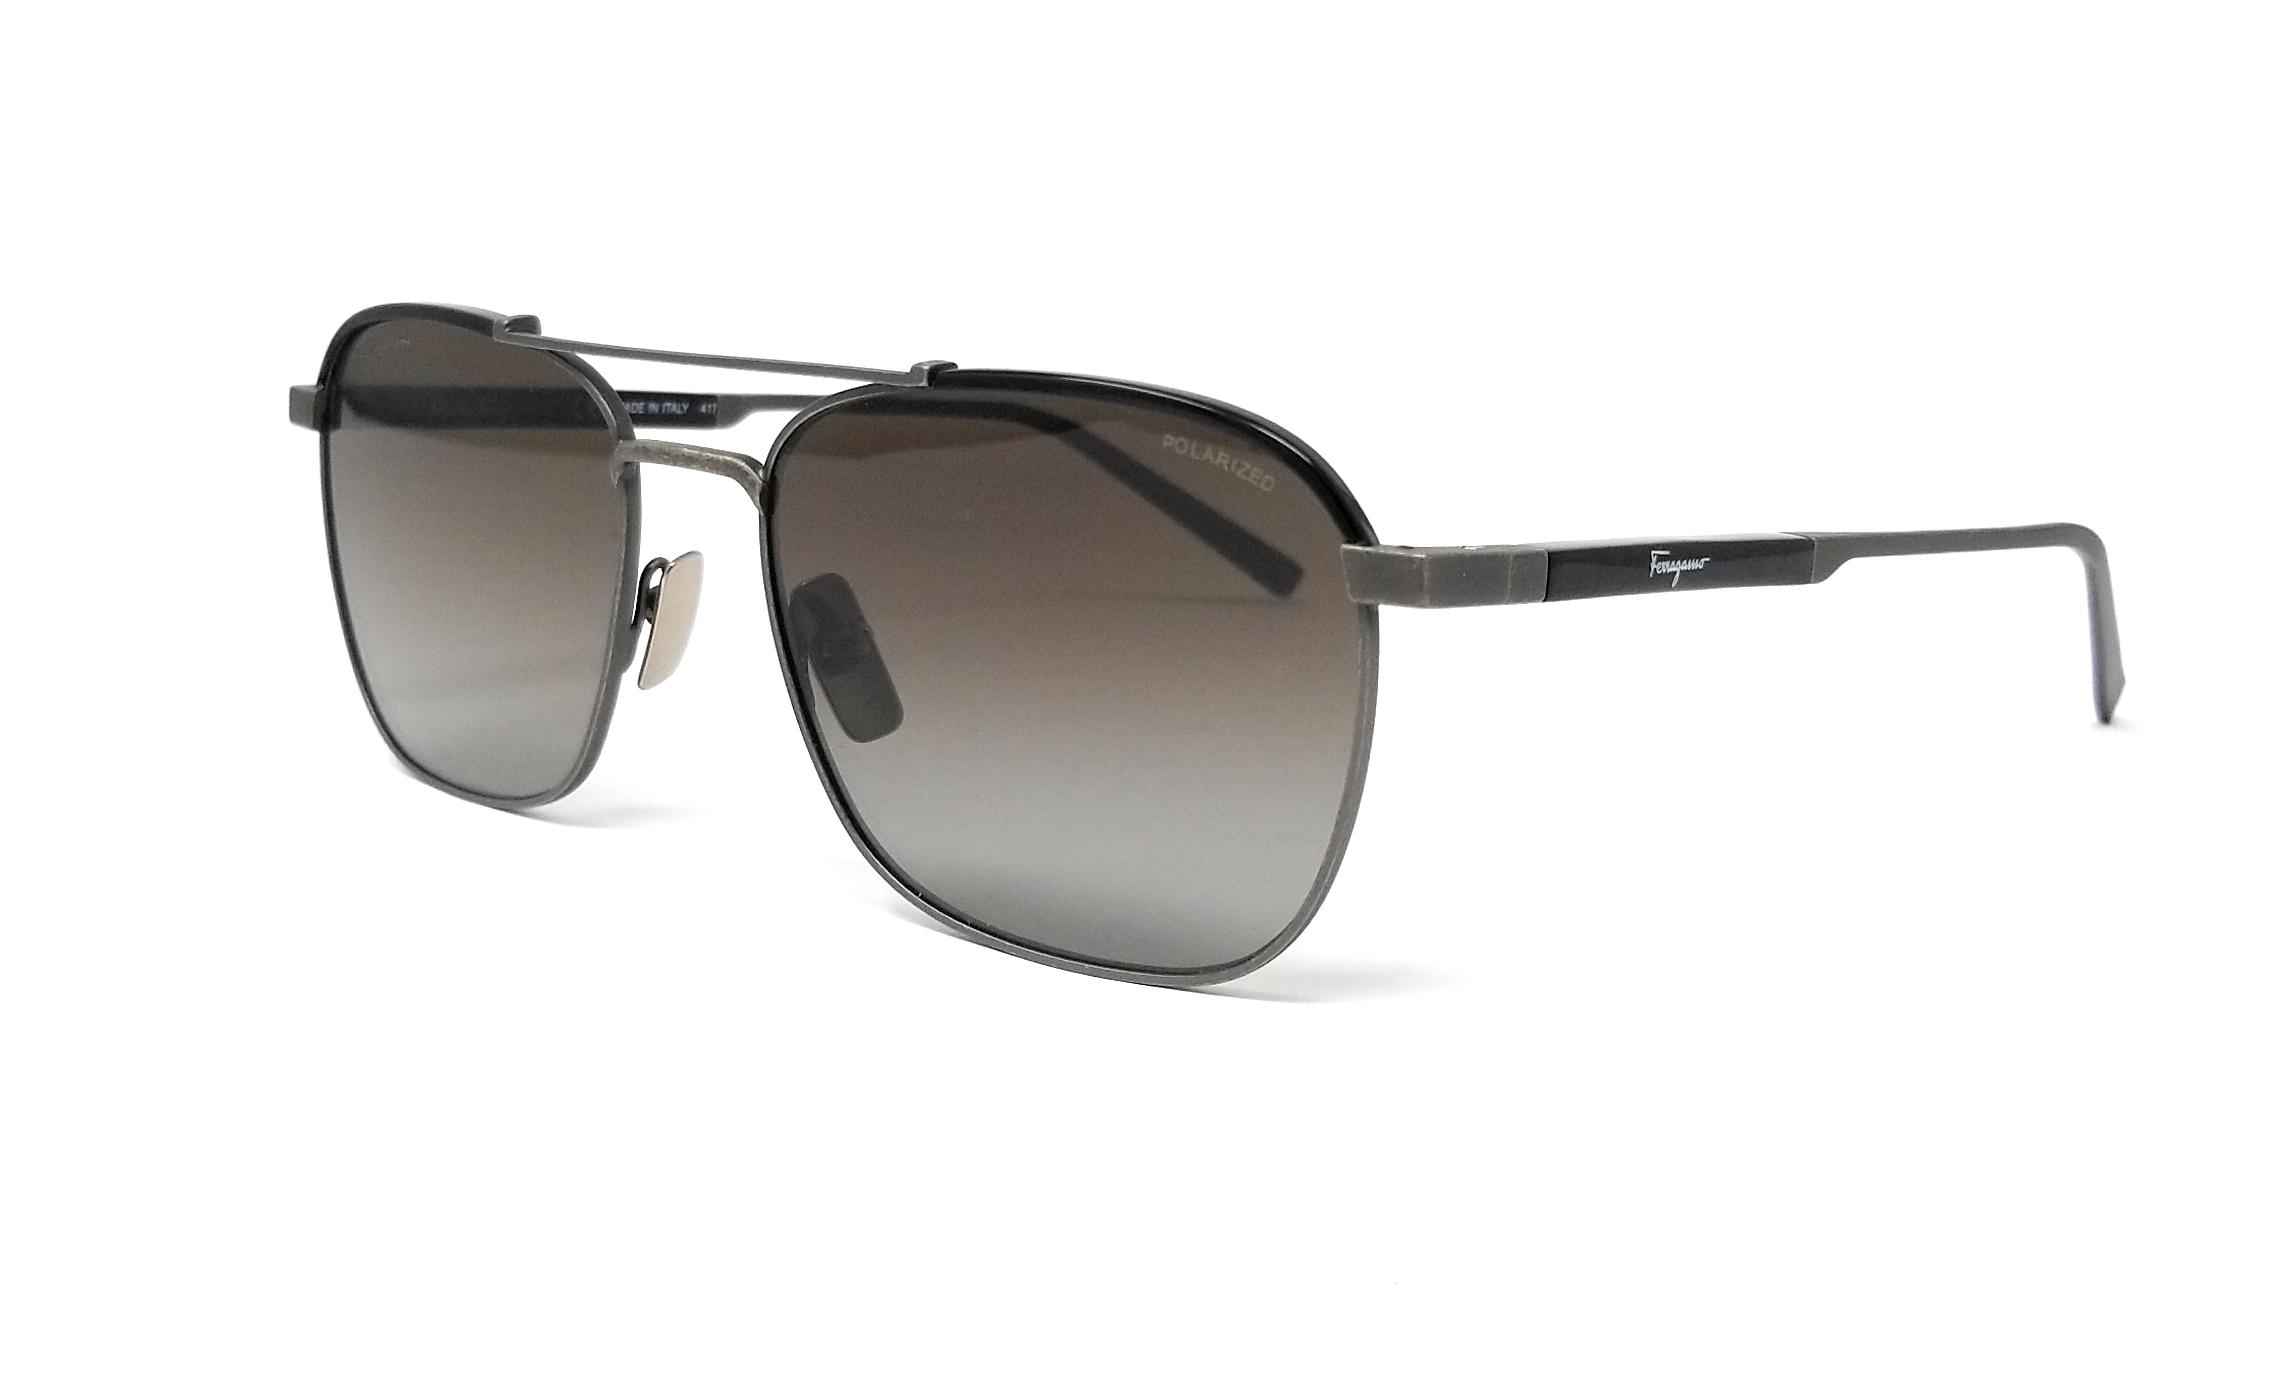 24586f46f692 Details about Salvatore Ferragamo Sunglasses Polarized SF162SP 074 Antique  Ruthenium-Black